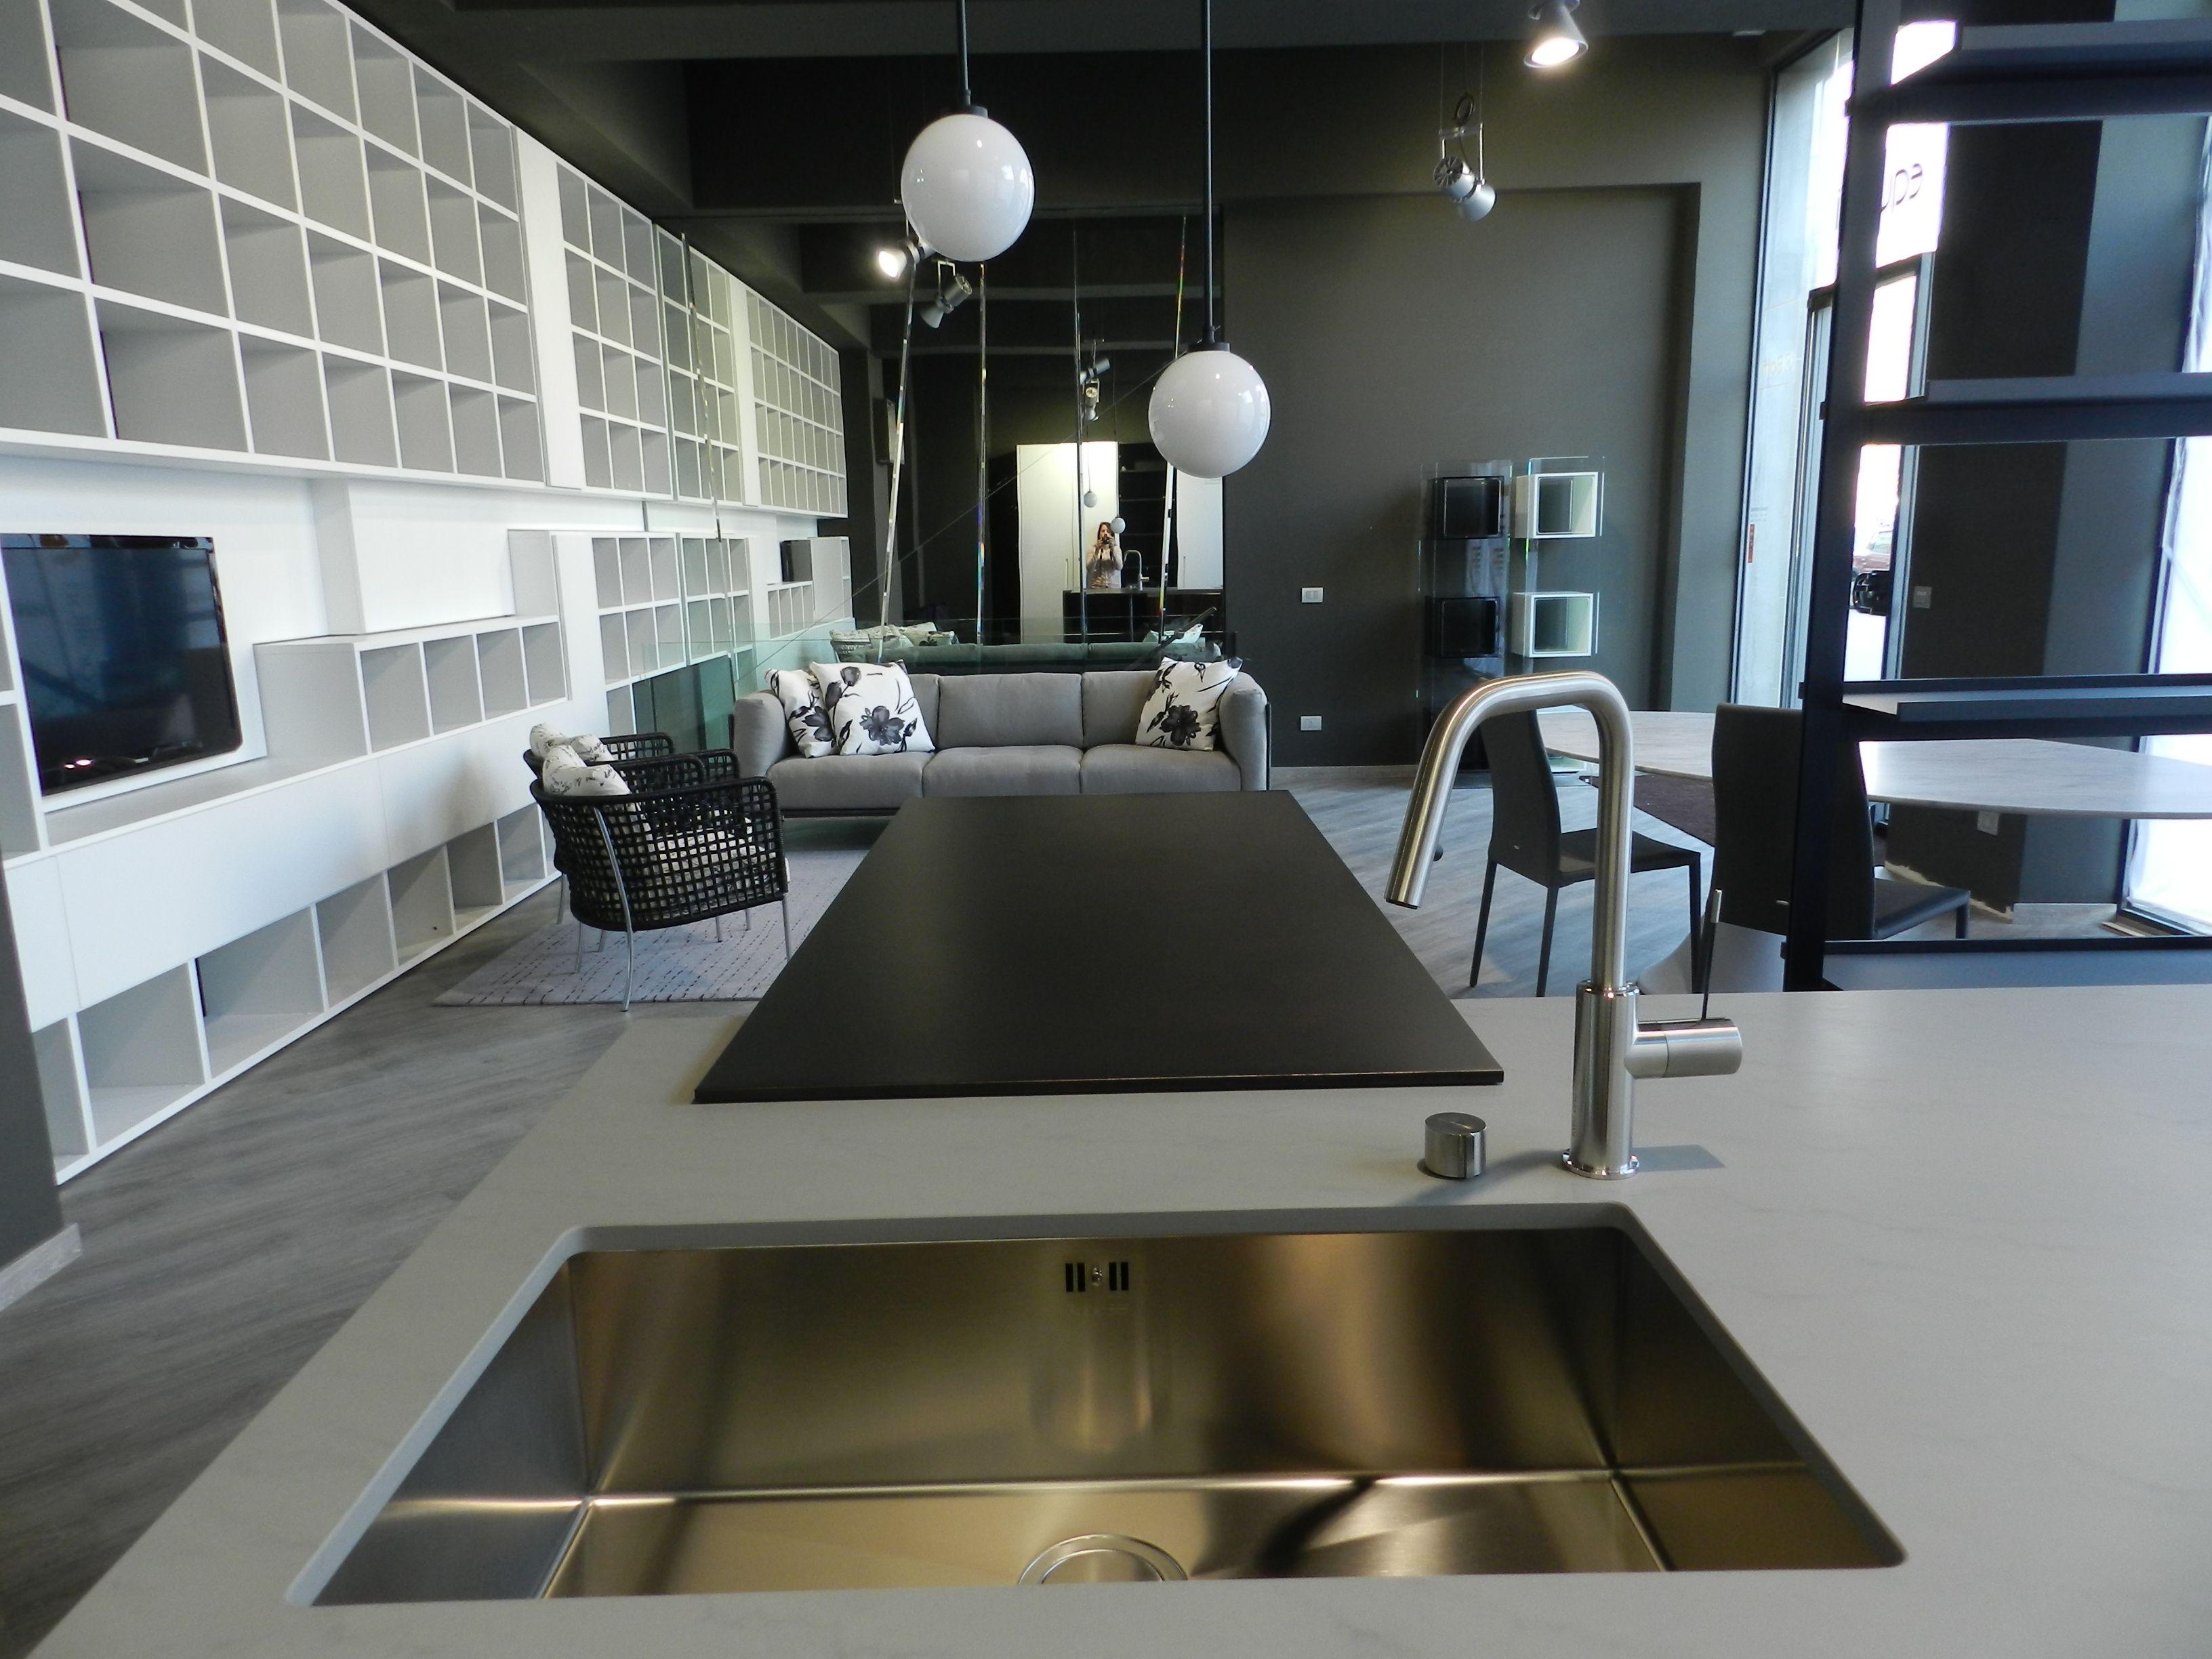 Ambiente: Cucina e libreria Boffi, libreria LEMA, divano poltroncine e tappeto LIVING divani.